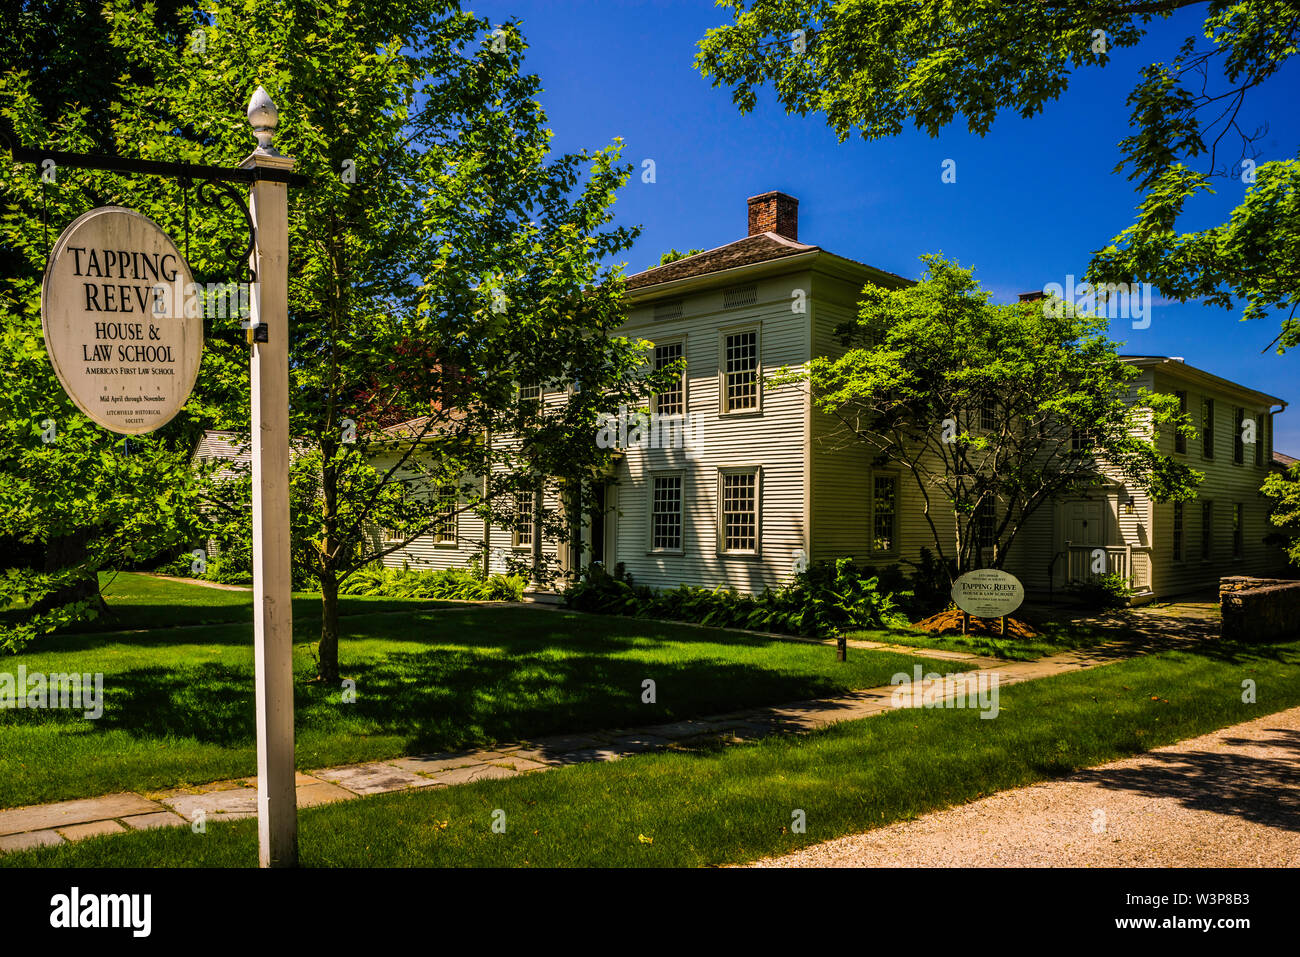 Litchfield Law School Litchfield Historic District _ Litchfield, Connecticut, USA - Stock Image